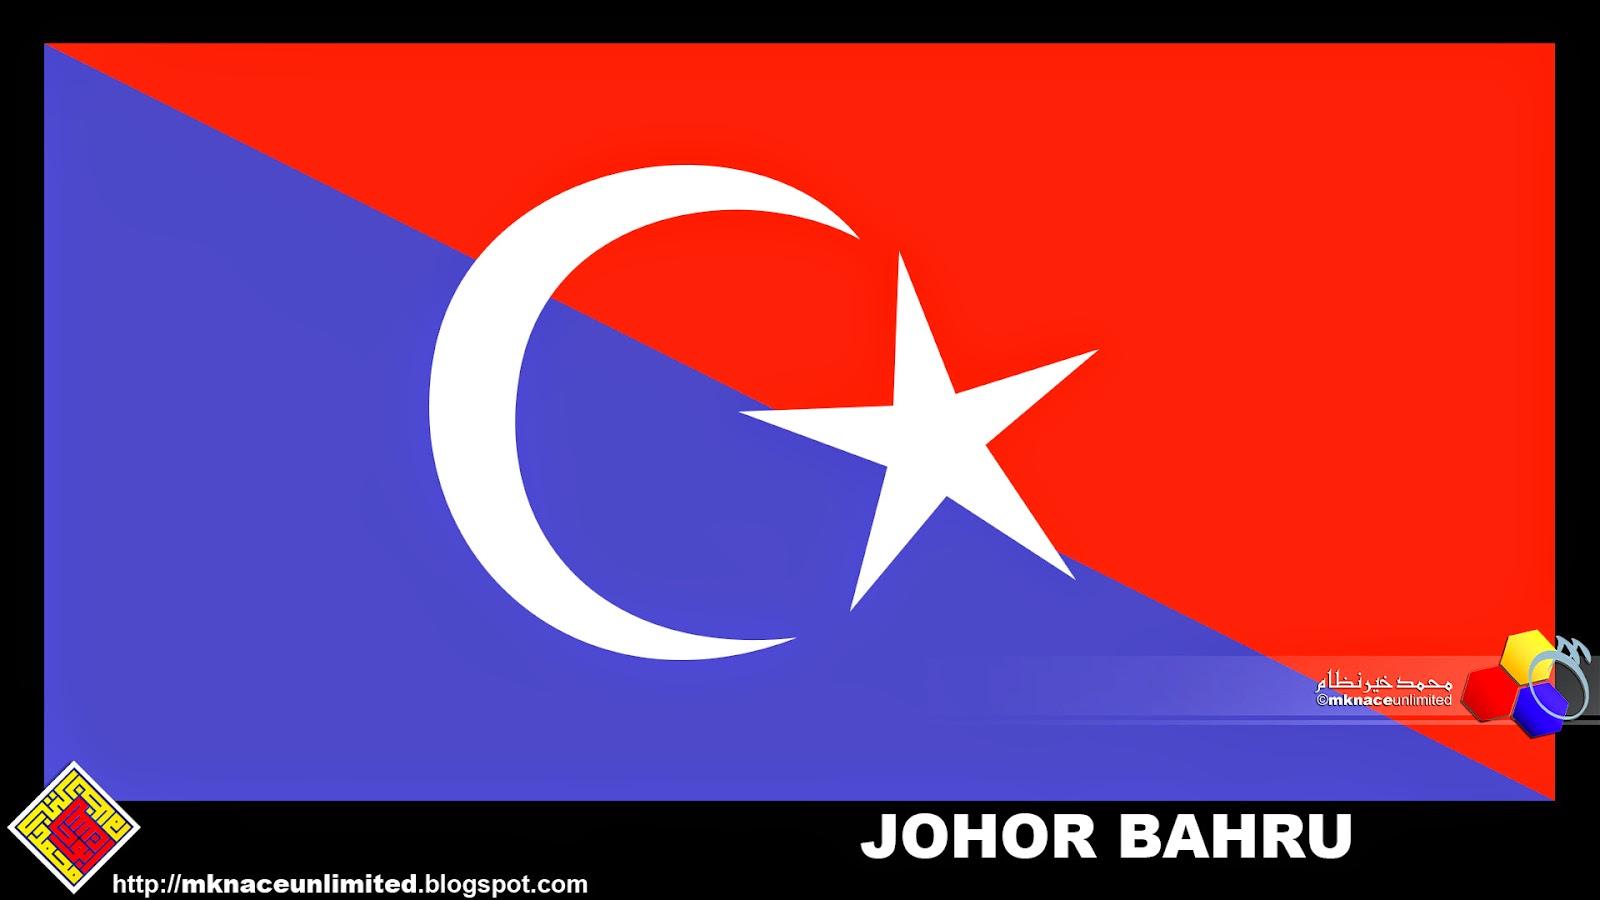 Bendera bendera daerah negeri johor mknace unlimited for Home wallpaper johor bahru